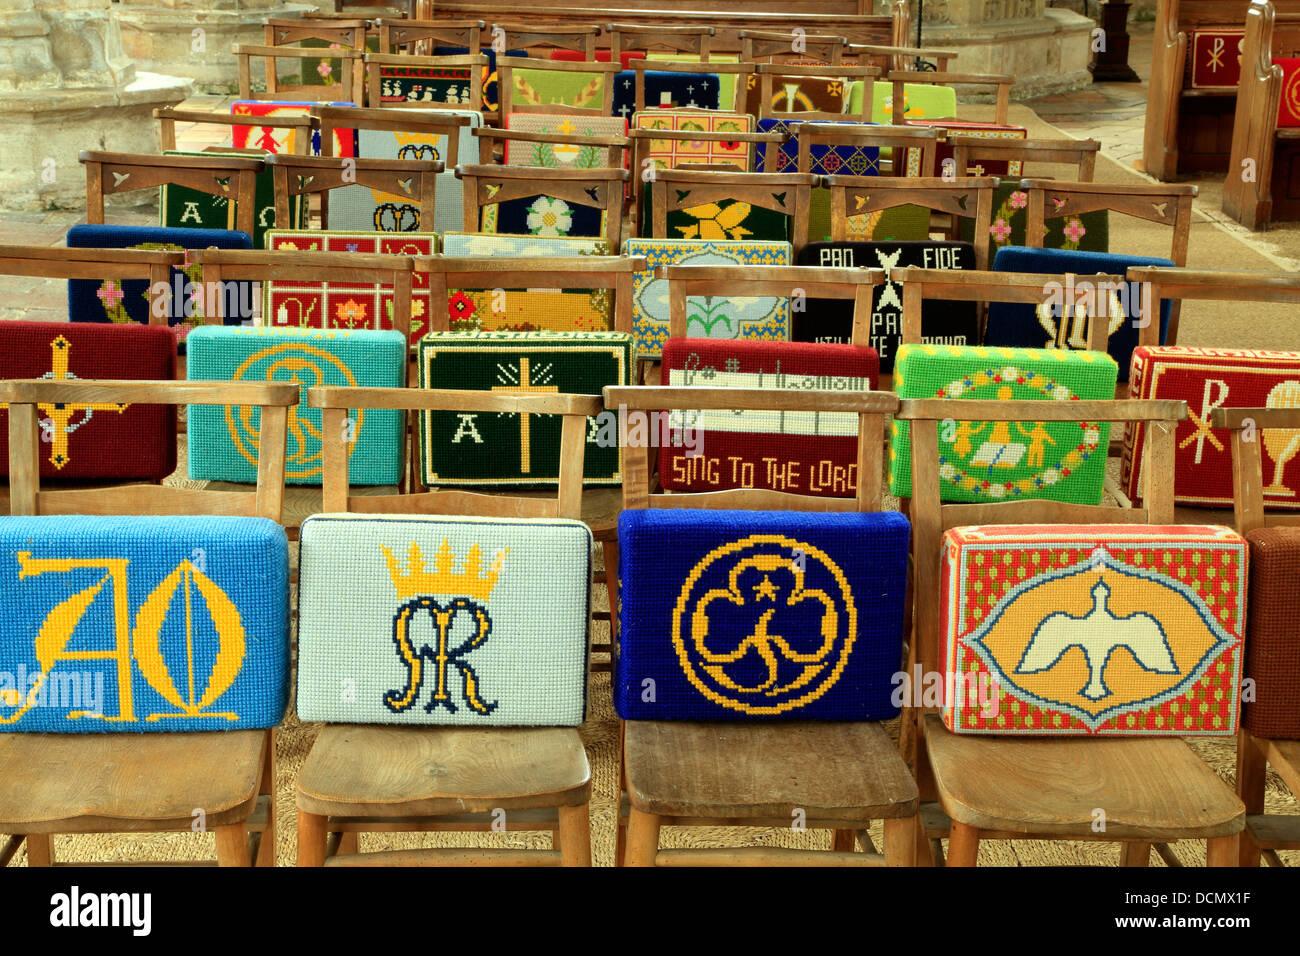 Kirche kniend Kissen Kirchenbank Kirchenbänke Stuhl Stühle bestickt Stickerei Deko Dekoration Kniebank Stockbild